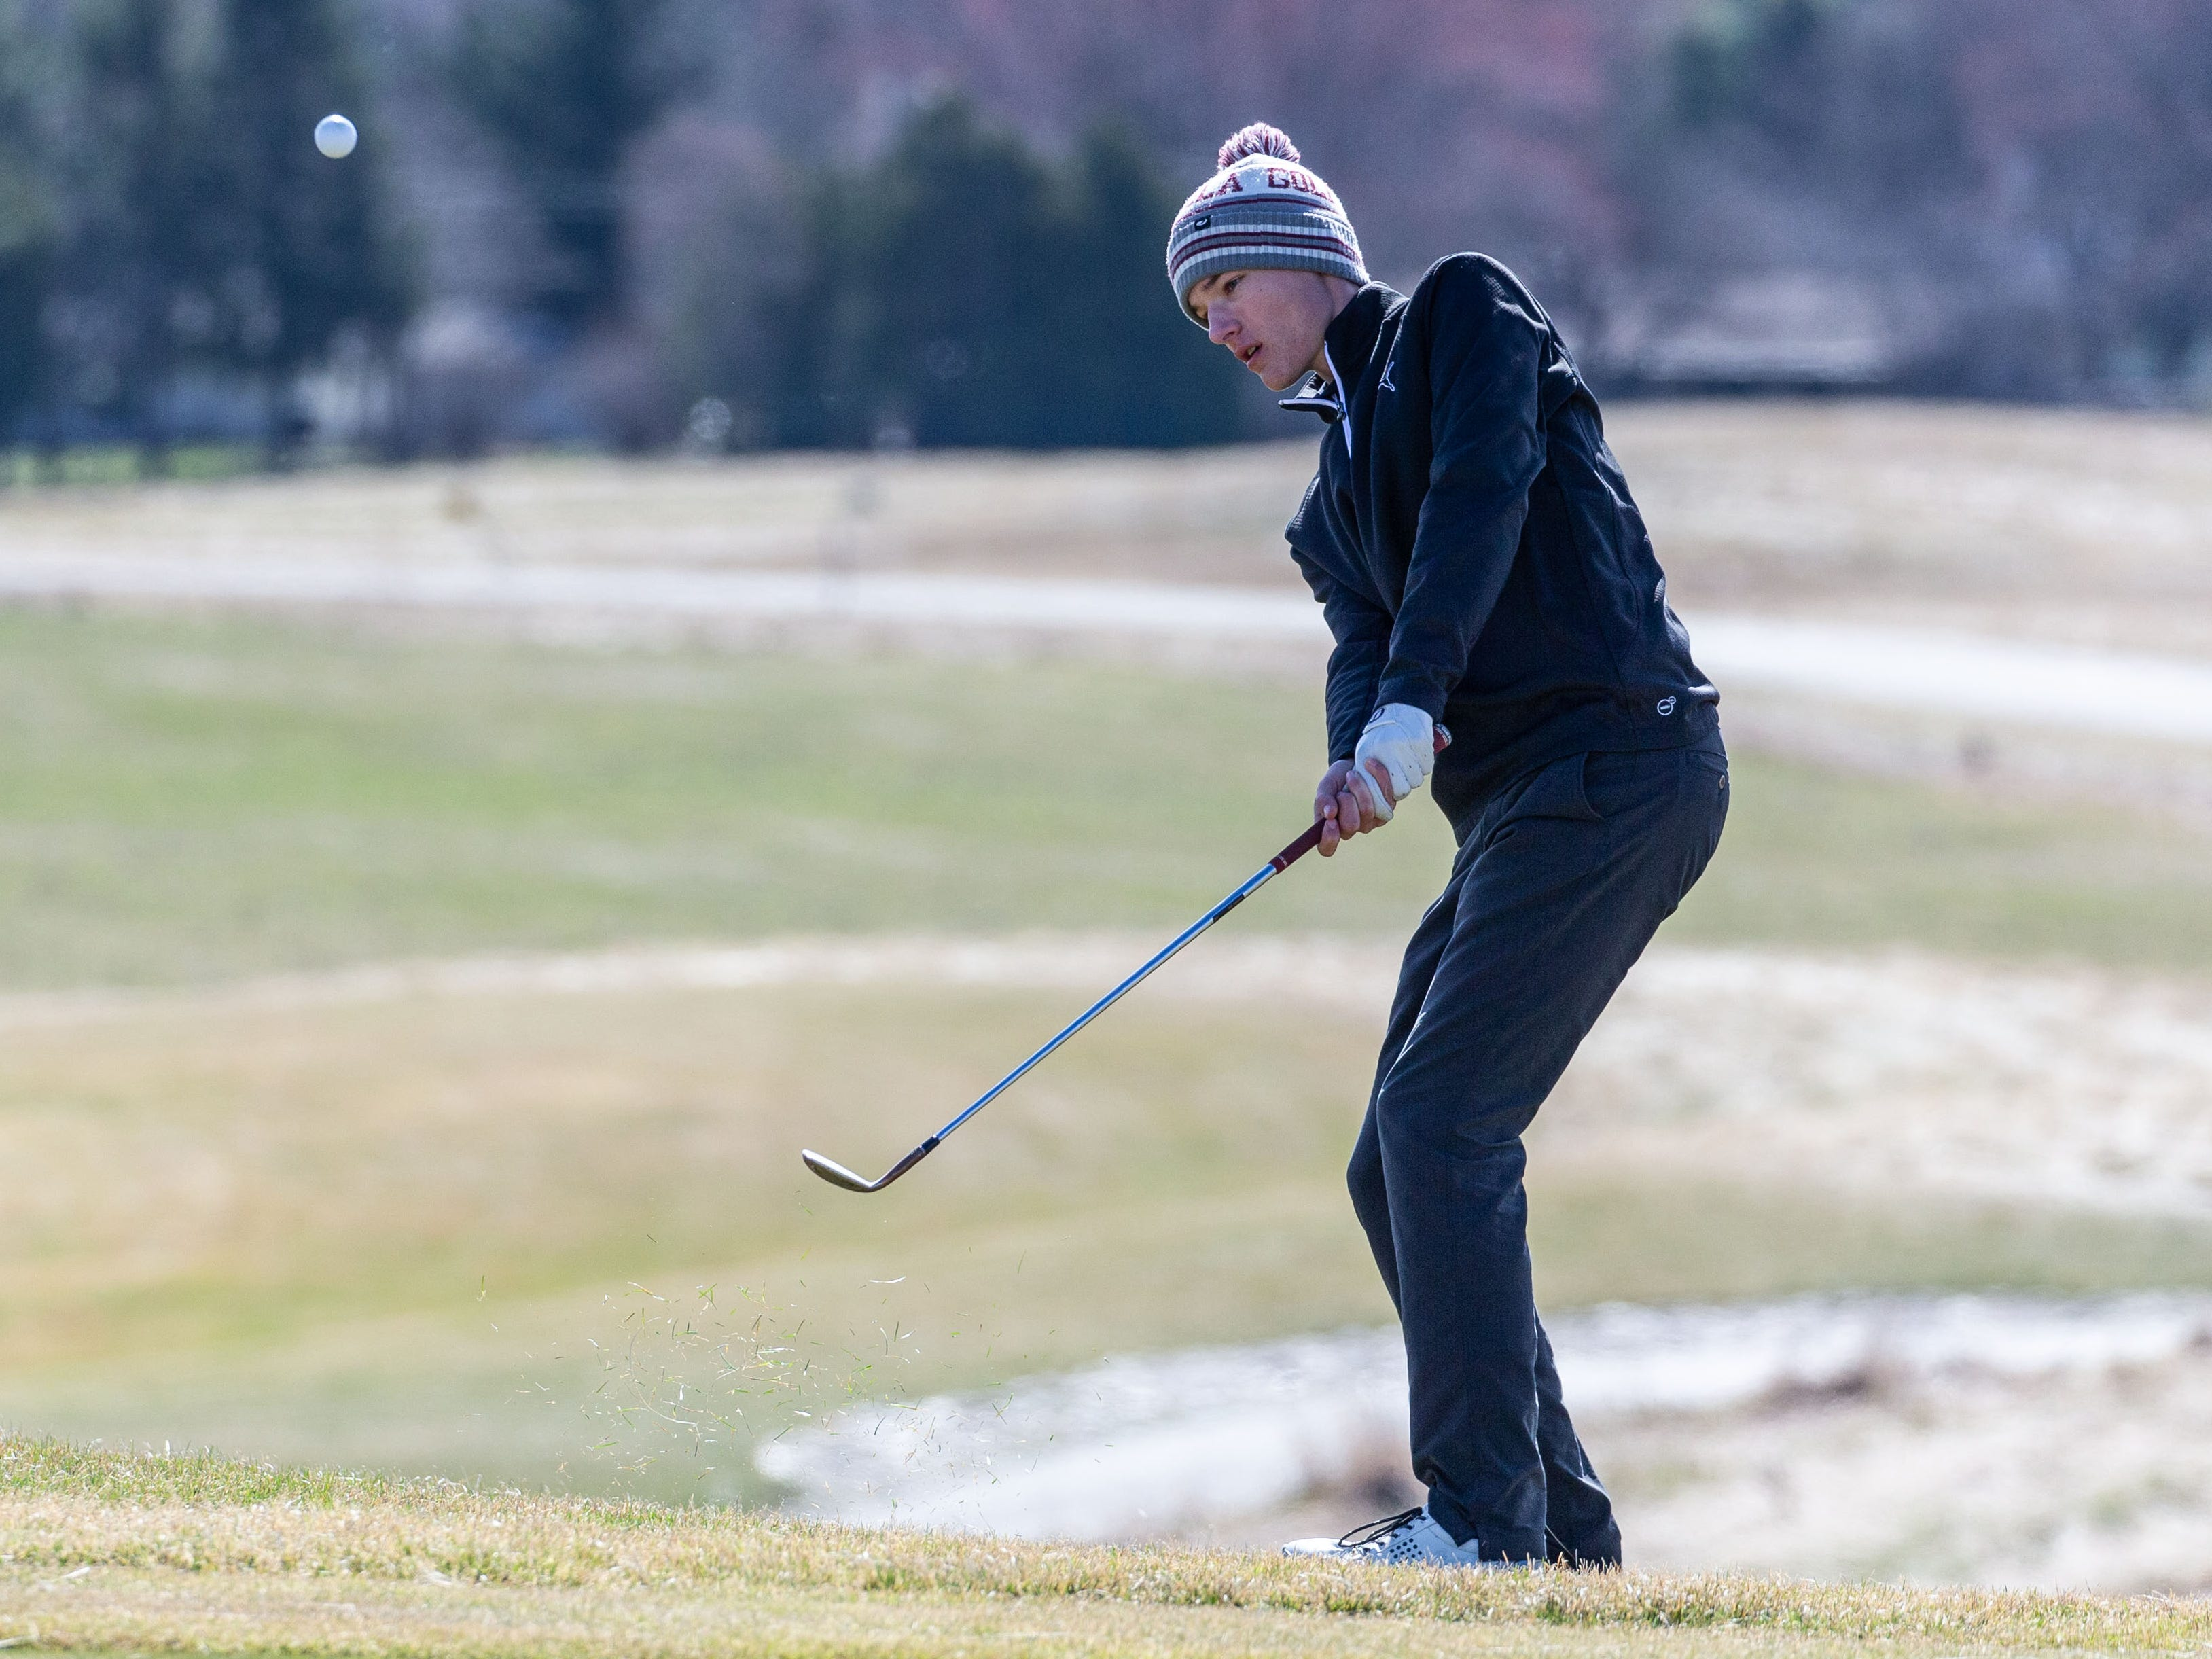 Mukwonago golfer Mason Schulz competes in the Catholic Memorial 2019 Crusader Invitational at Broadlands Golf Club in North Prairie on Saturday, April 13, 2019.